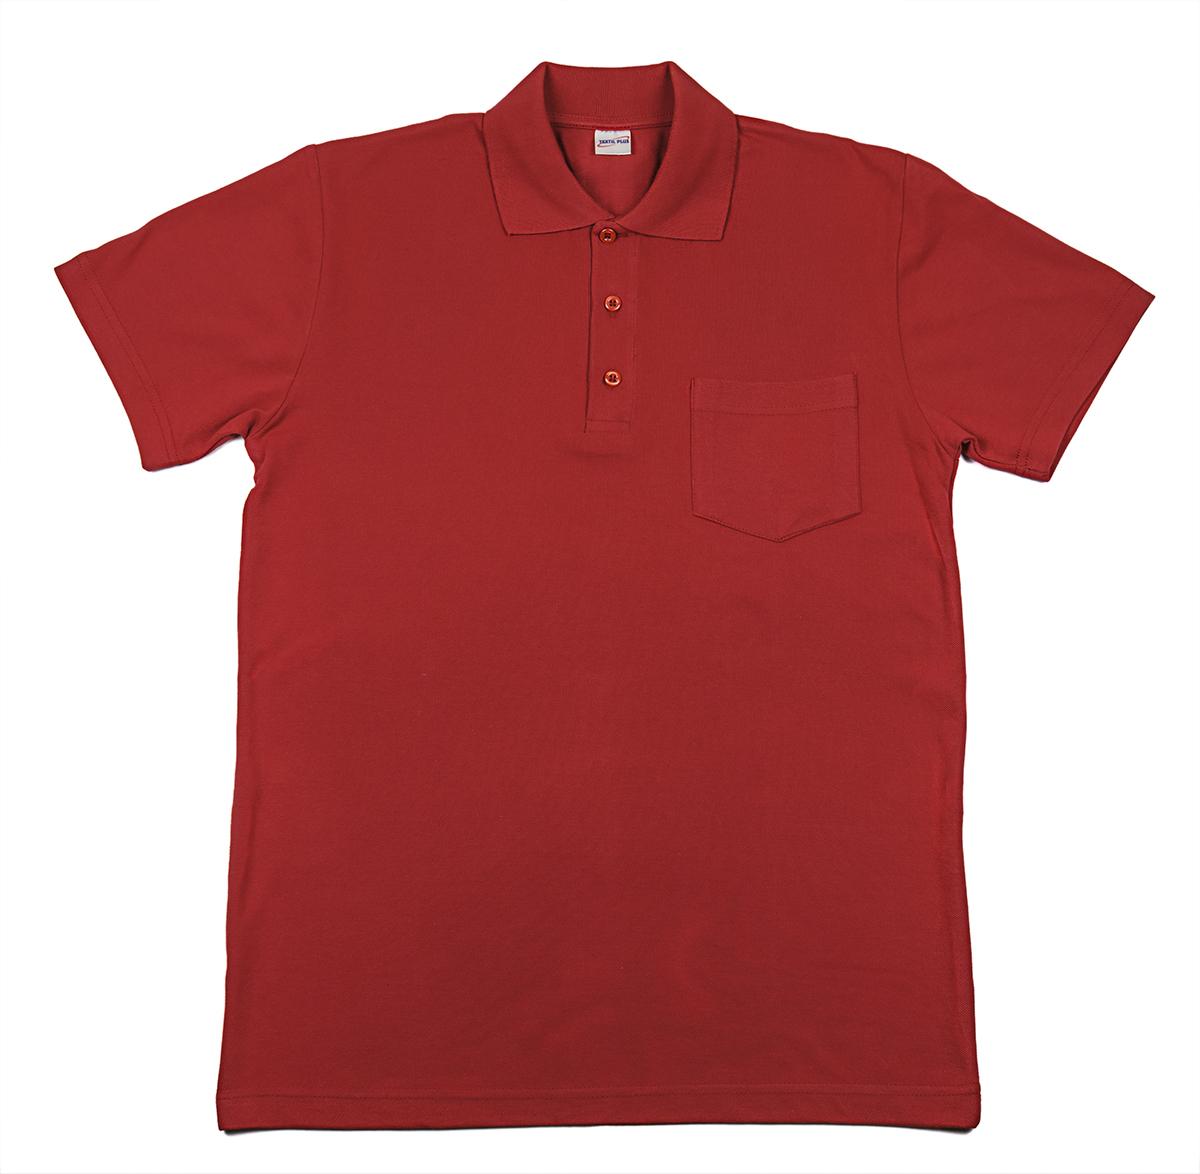 Мужская футболка-поло Team Polo Pocket, цвет Белый, размер 50Майки и футболки<br><br><br>Тип: Муж. футболка<br>Размер: 50<br>Материал: Хлопок